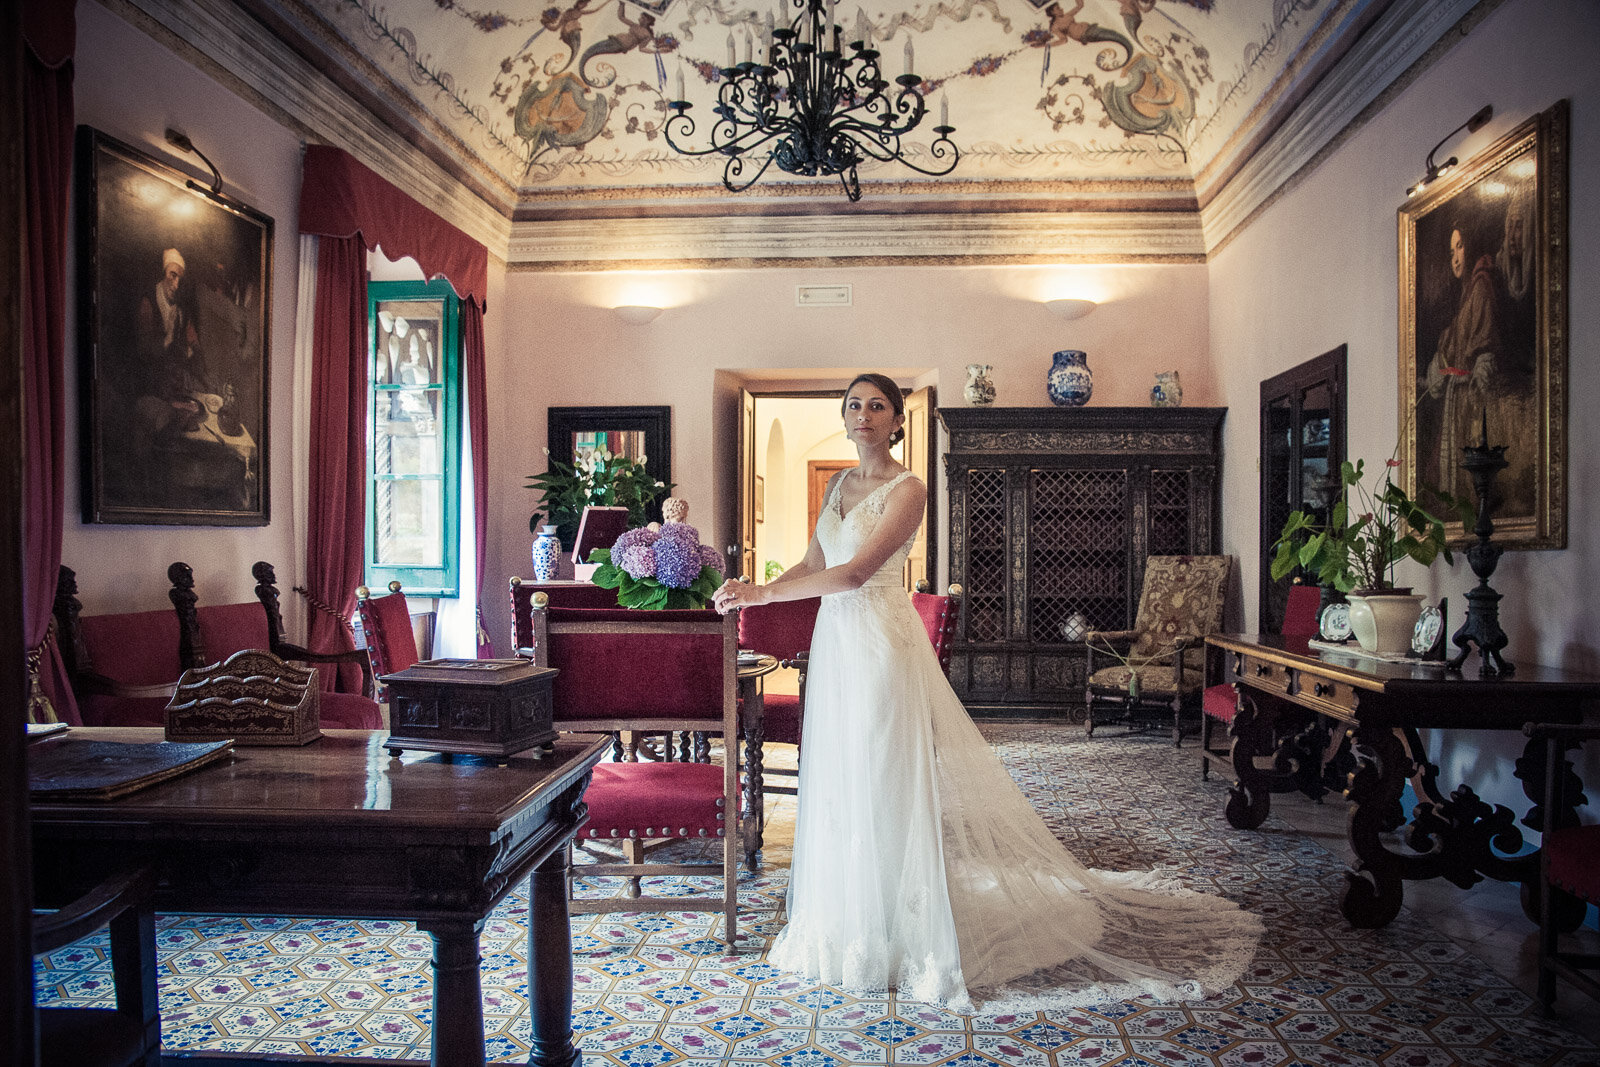 Russian Wedding in Villa Cimbrone Costiera Amalfitana 08.jpg